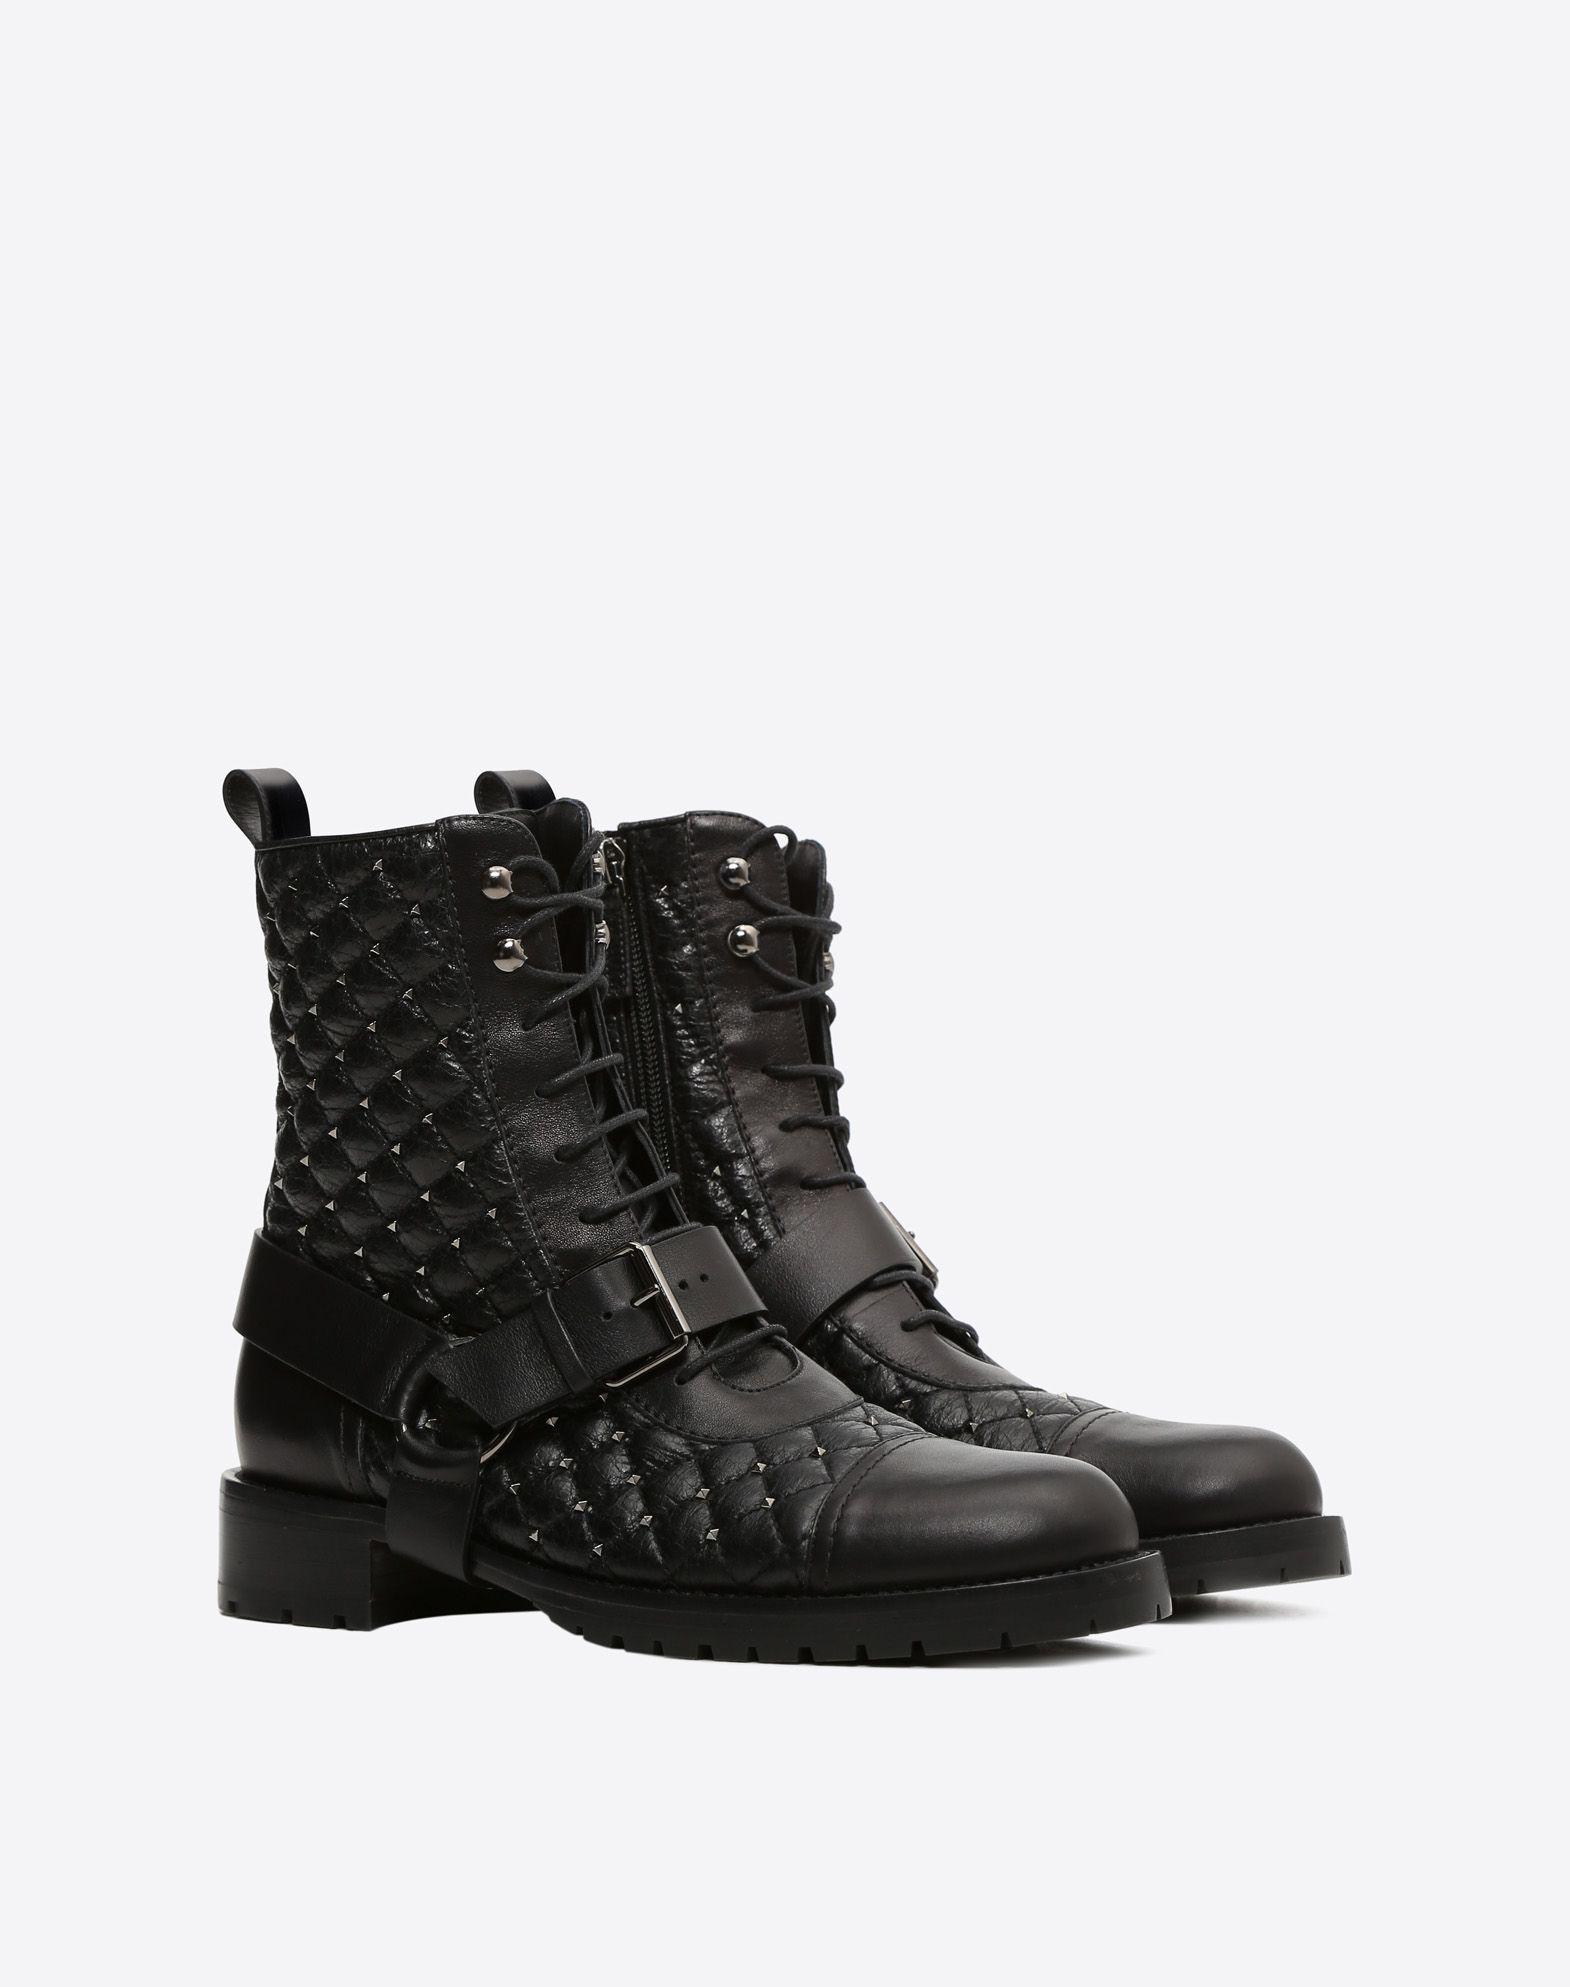 ... VALENTINO GARAVANI Rockstud Spike biker boot Bootie D r ...